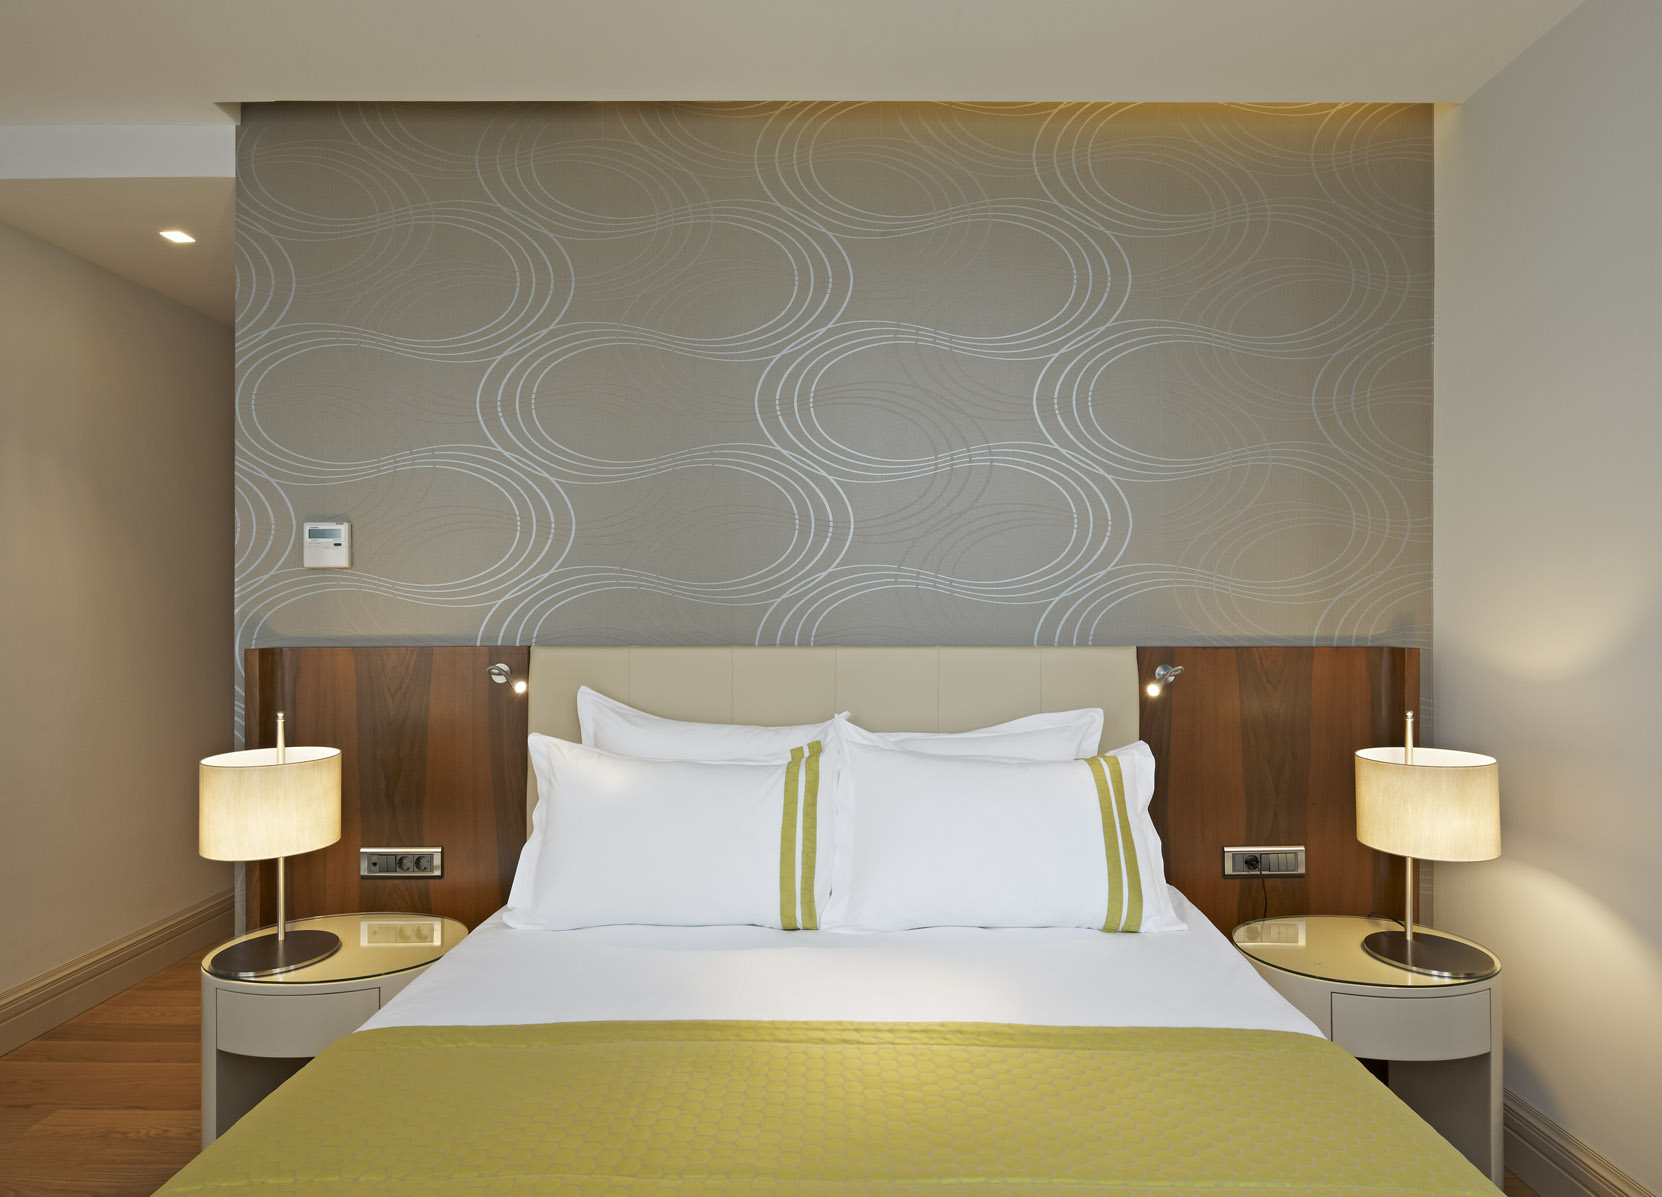 هتل سناتور تکسیم استانبول